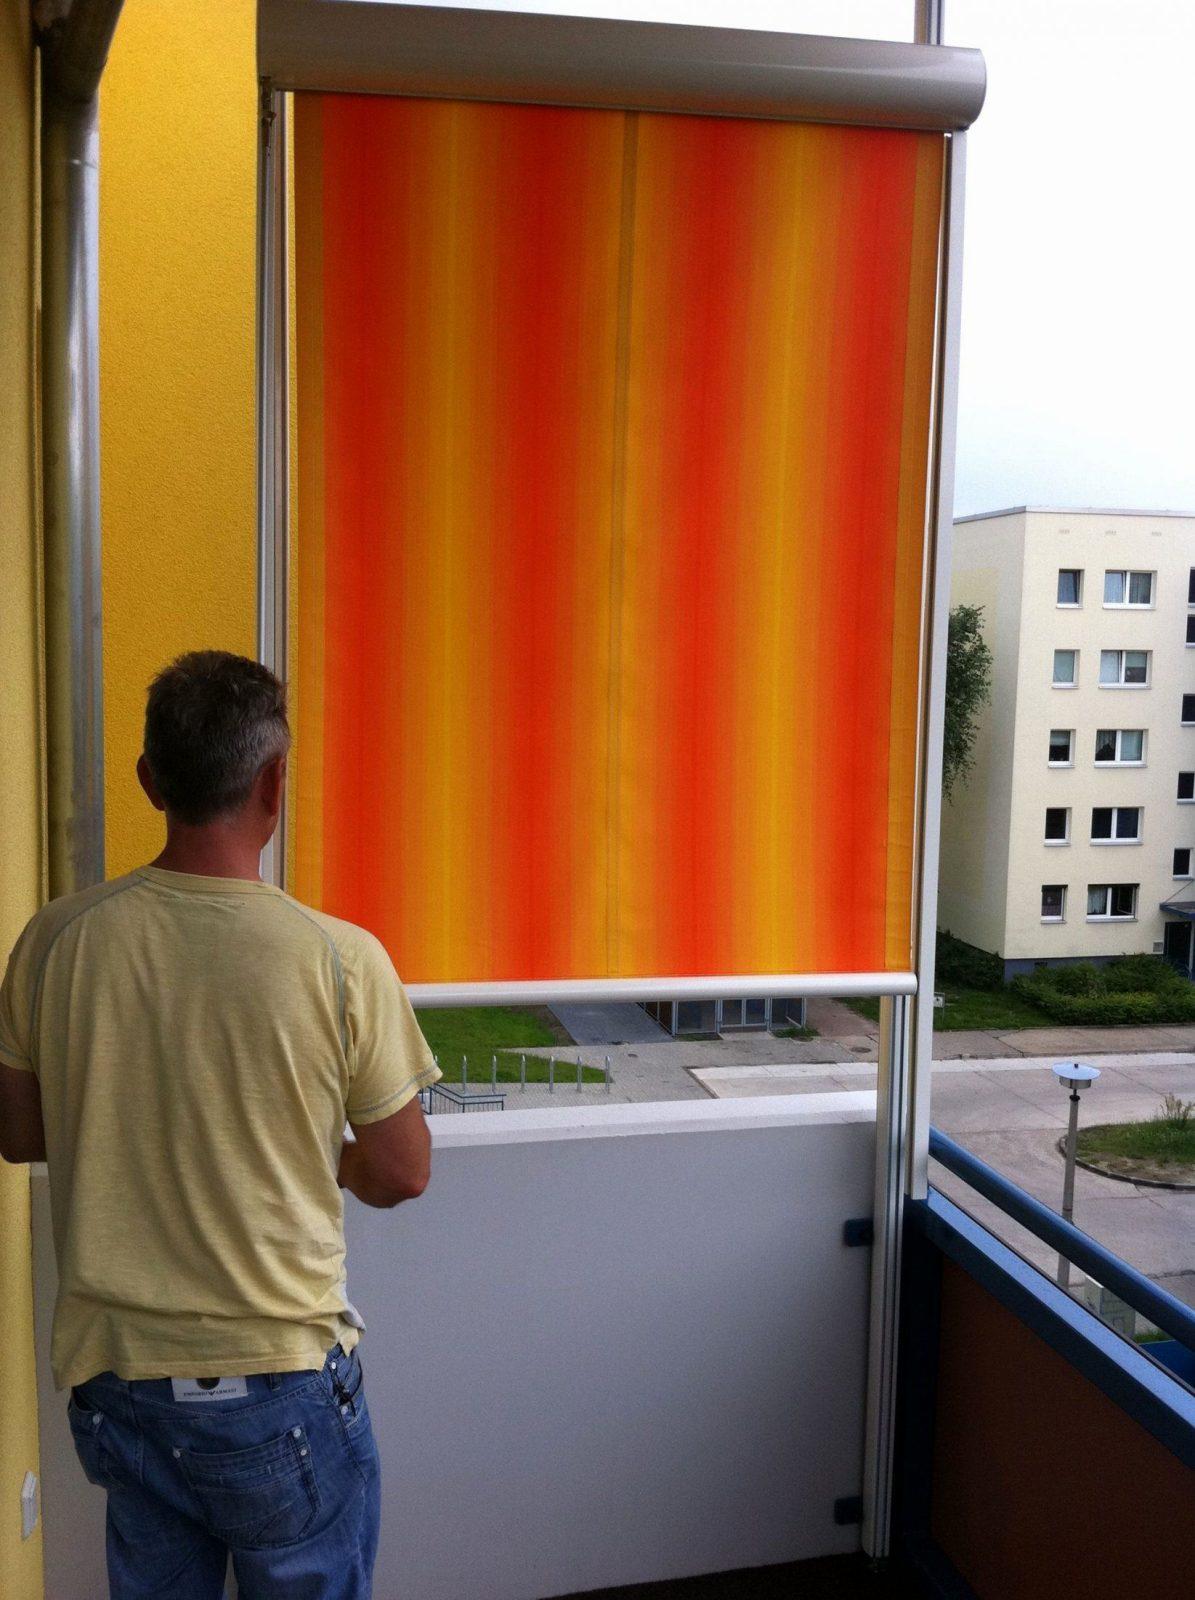 Markisen Ohne Bohren Neu Markise Fr Balkon Ohne Bohren Balkon von Balkon Sichtschutz Seitlich Ohne Bohren Bild